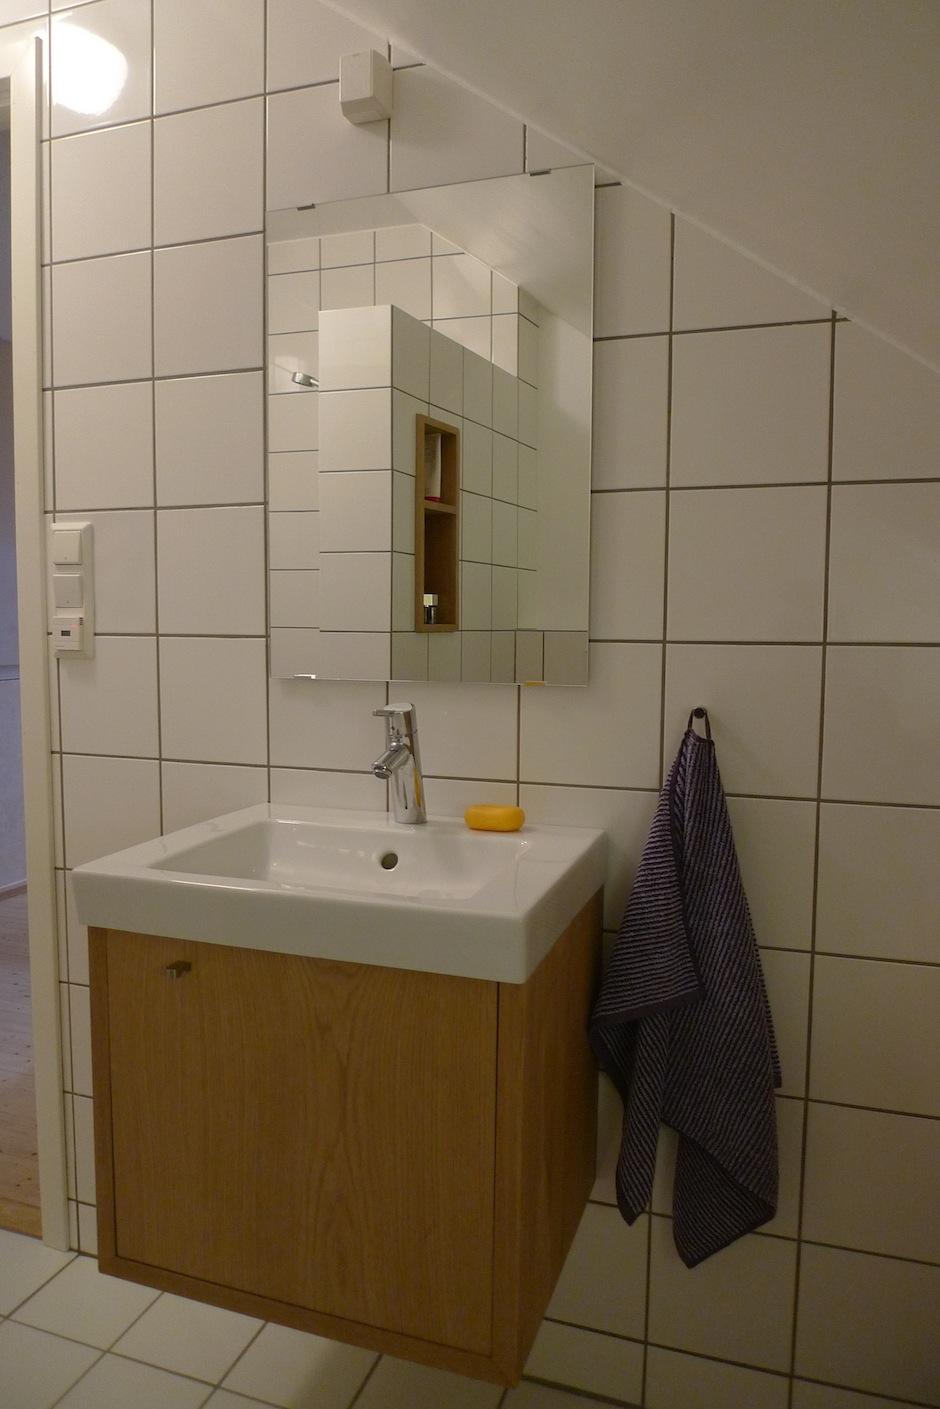 Baderoms møbler: tidan. norfloor sarpsborg fliser, bad ...